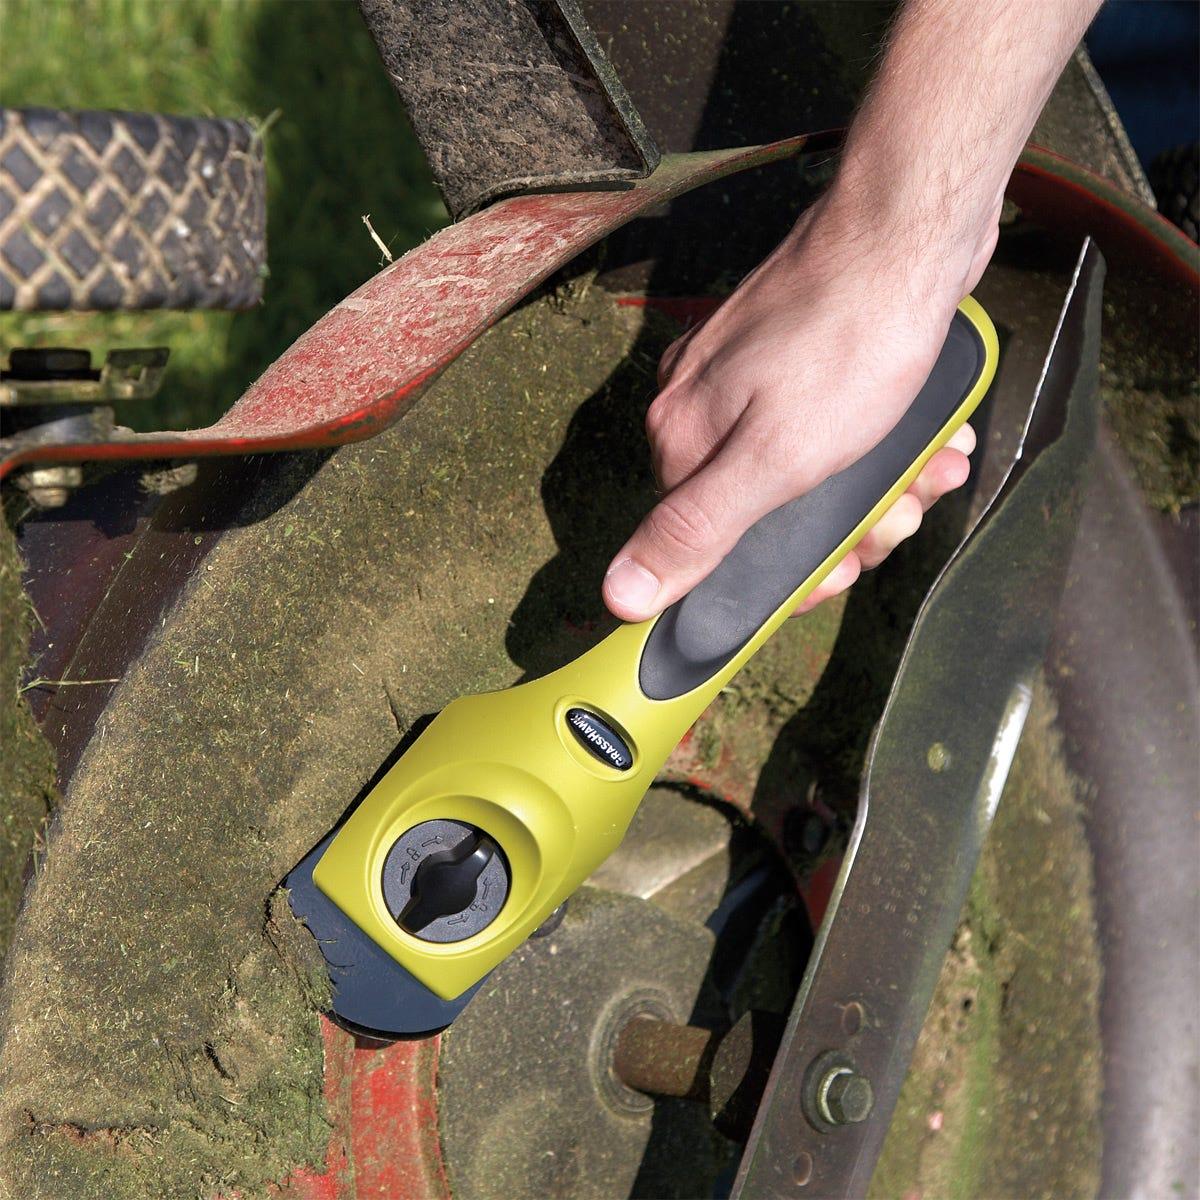 Ultimate Lawn Mower Deck Scraper From Sporty S Tool Shop